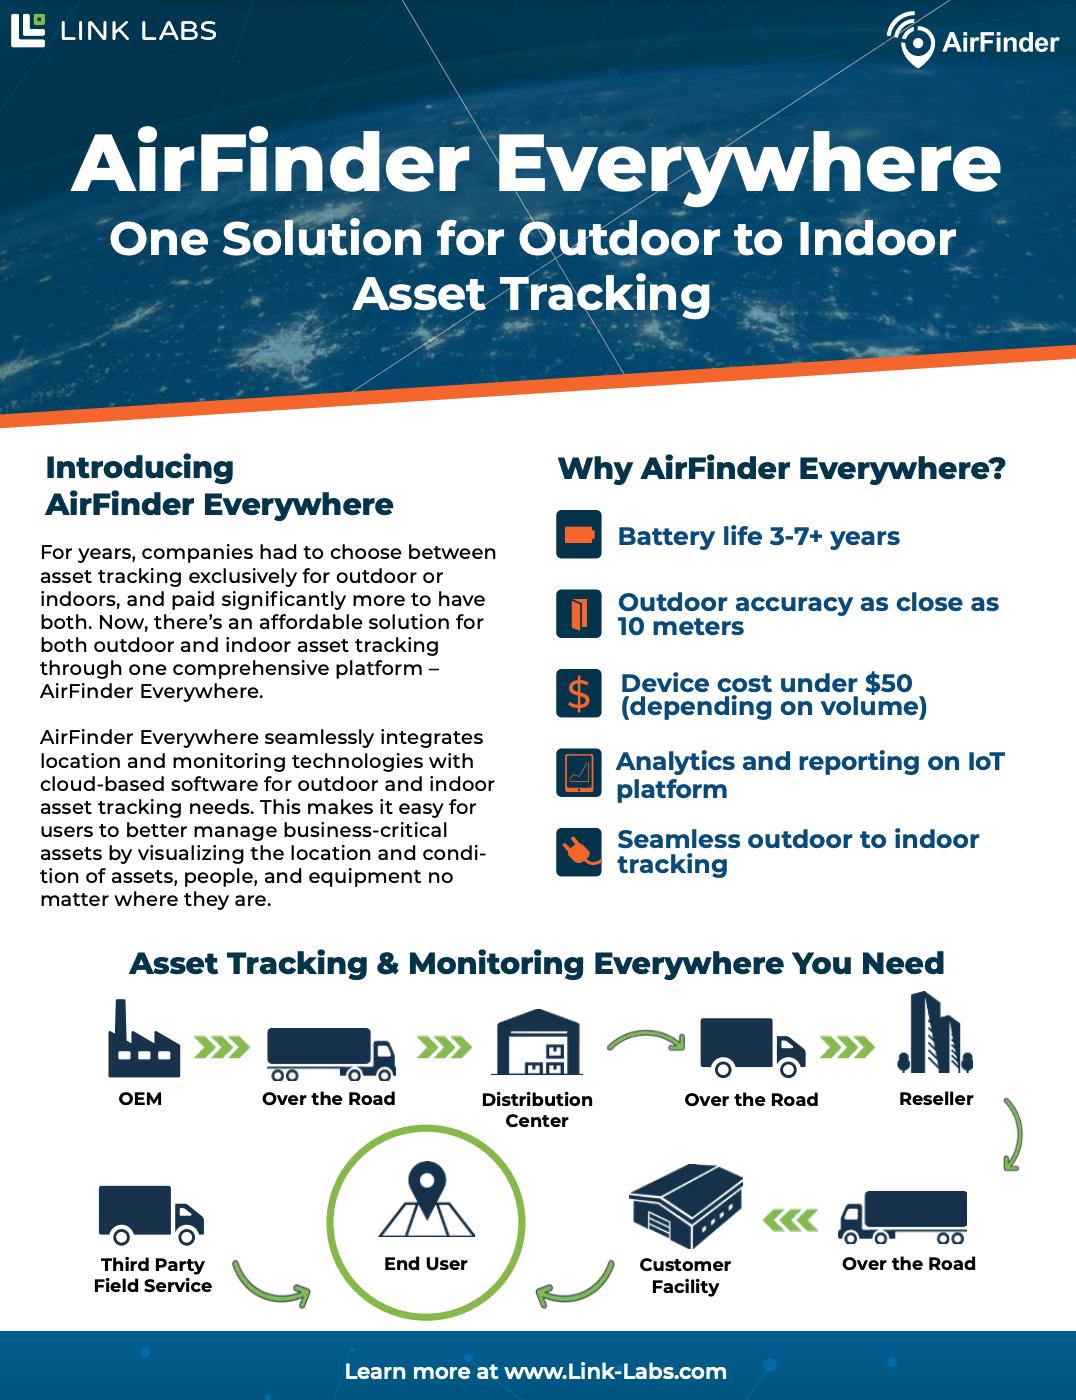 AirFinder-Everywhere-ProductBrief